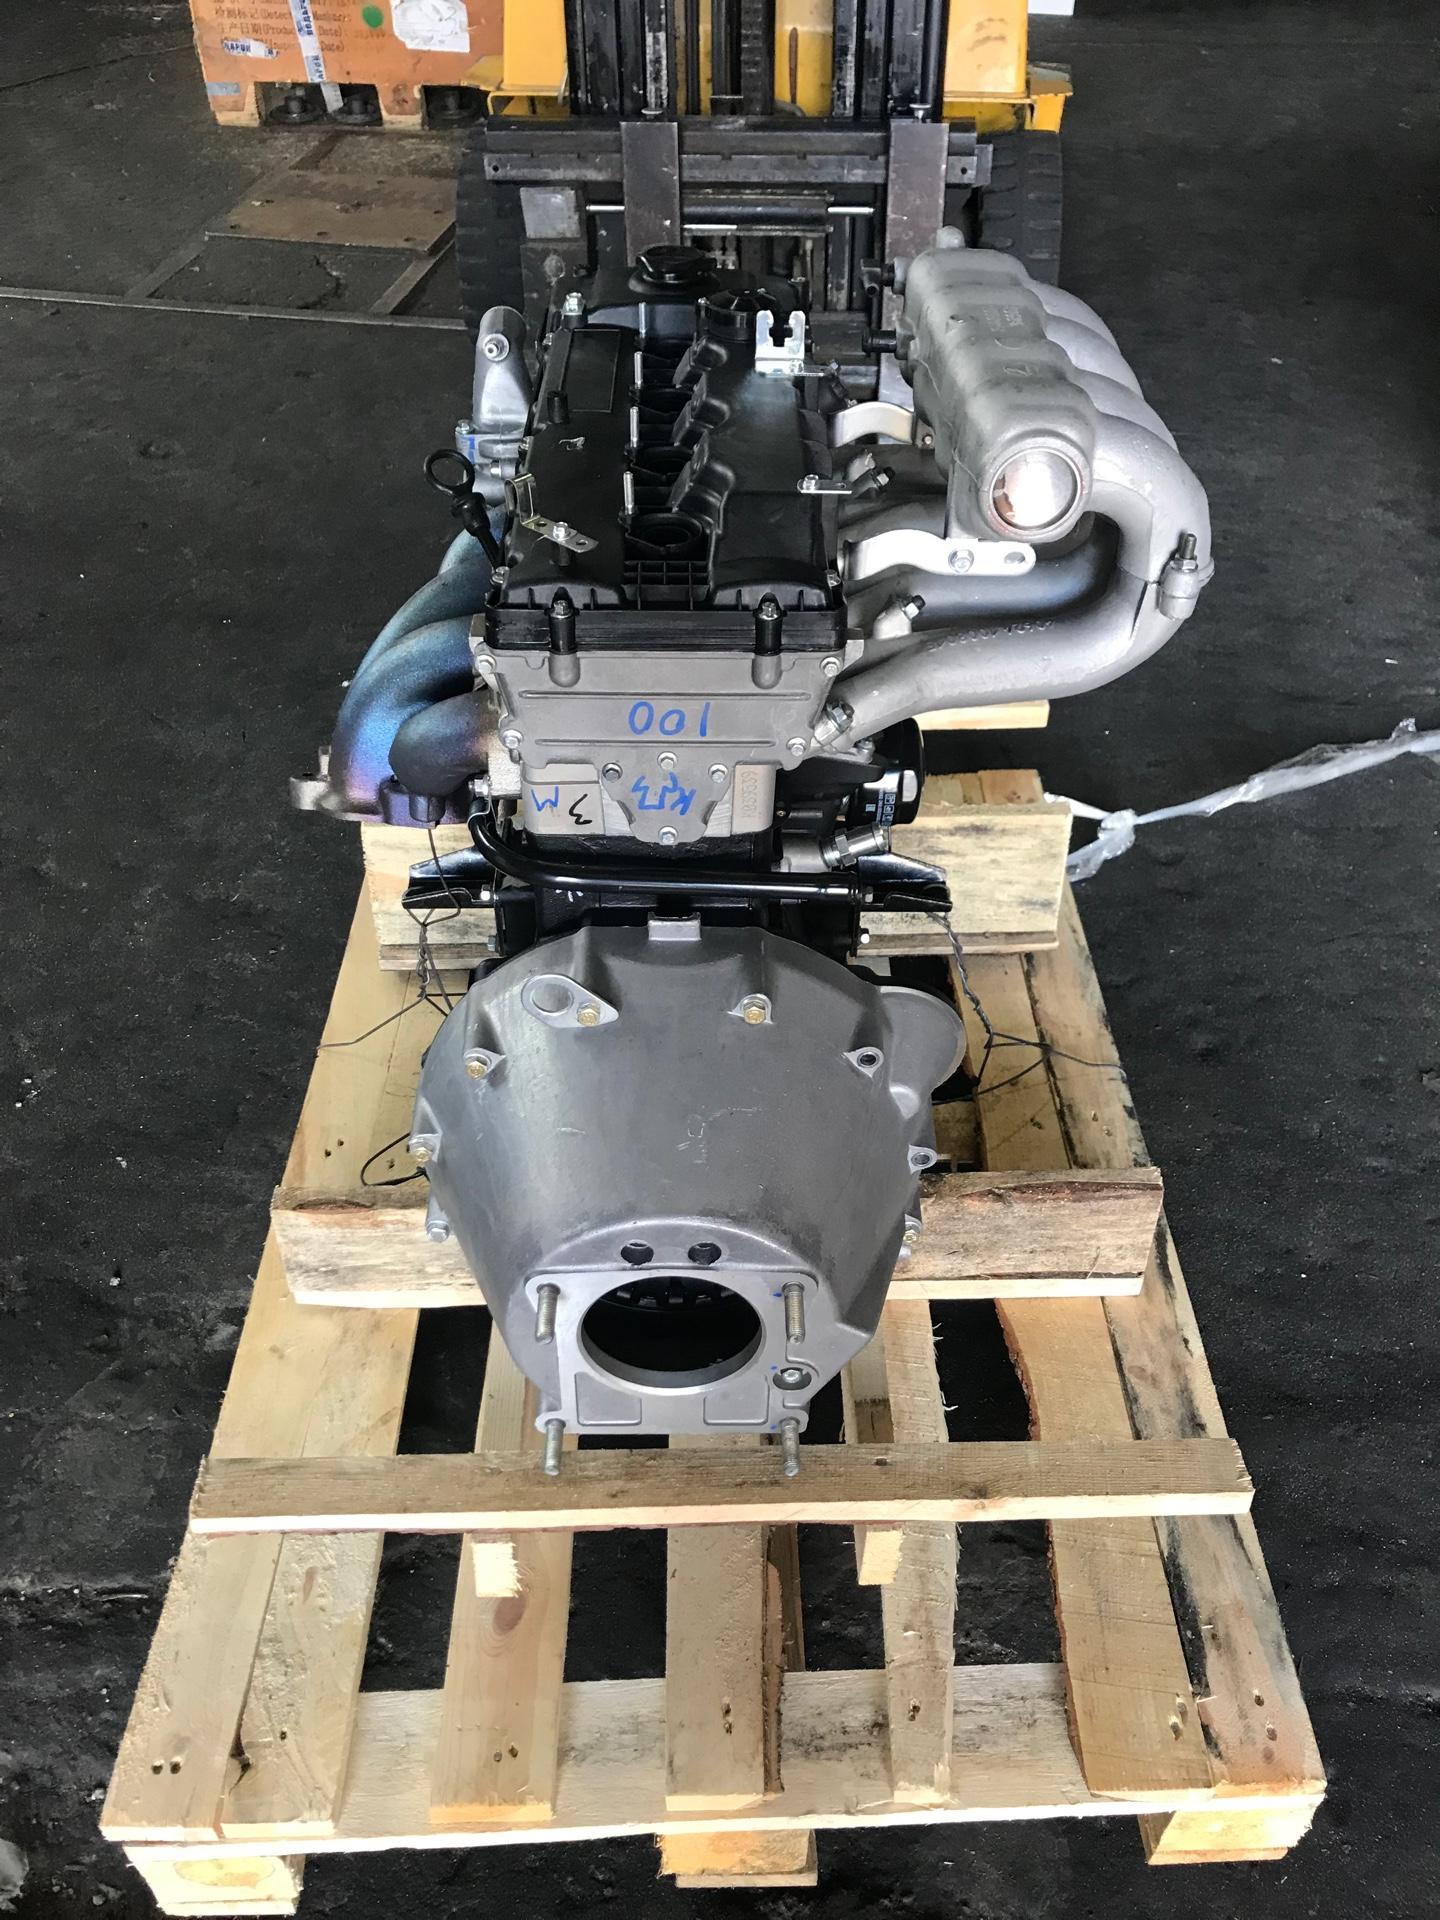 Переоборудования двигателя с УМЗ-4216 на ЗМЗ 40524.1000400